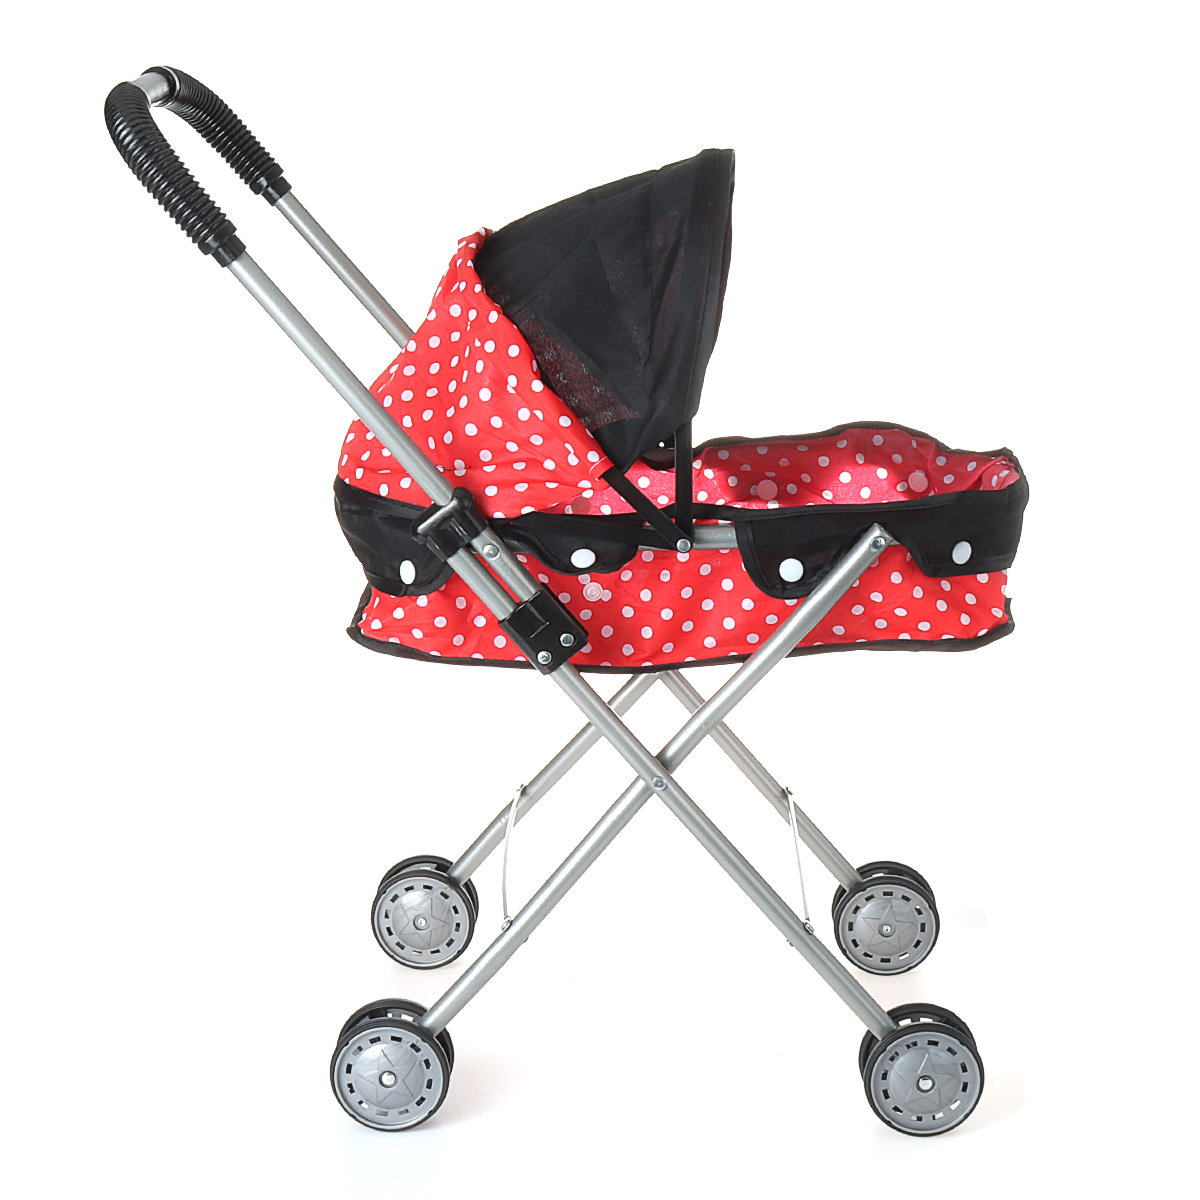 Hiking Packs - Baby Doll Stroller Folding Doll Trolley ...